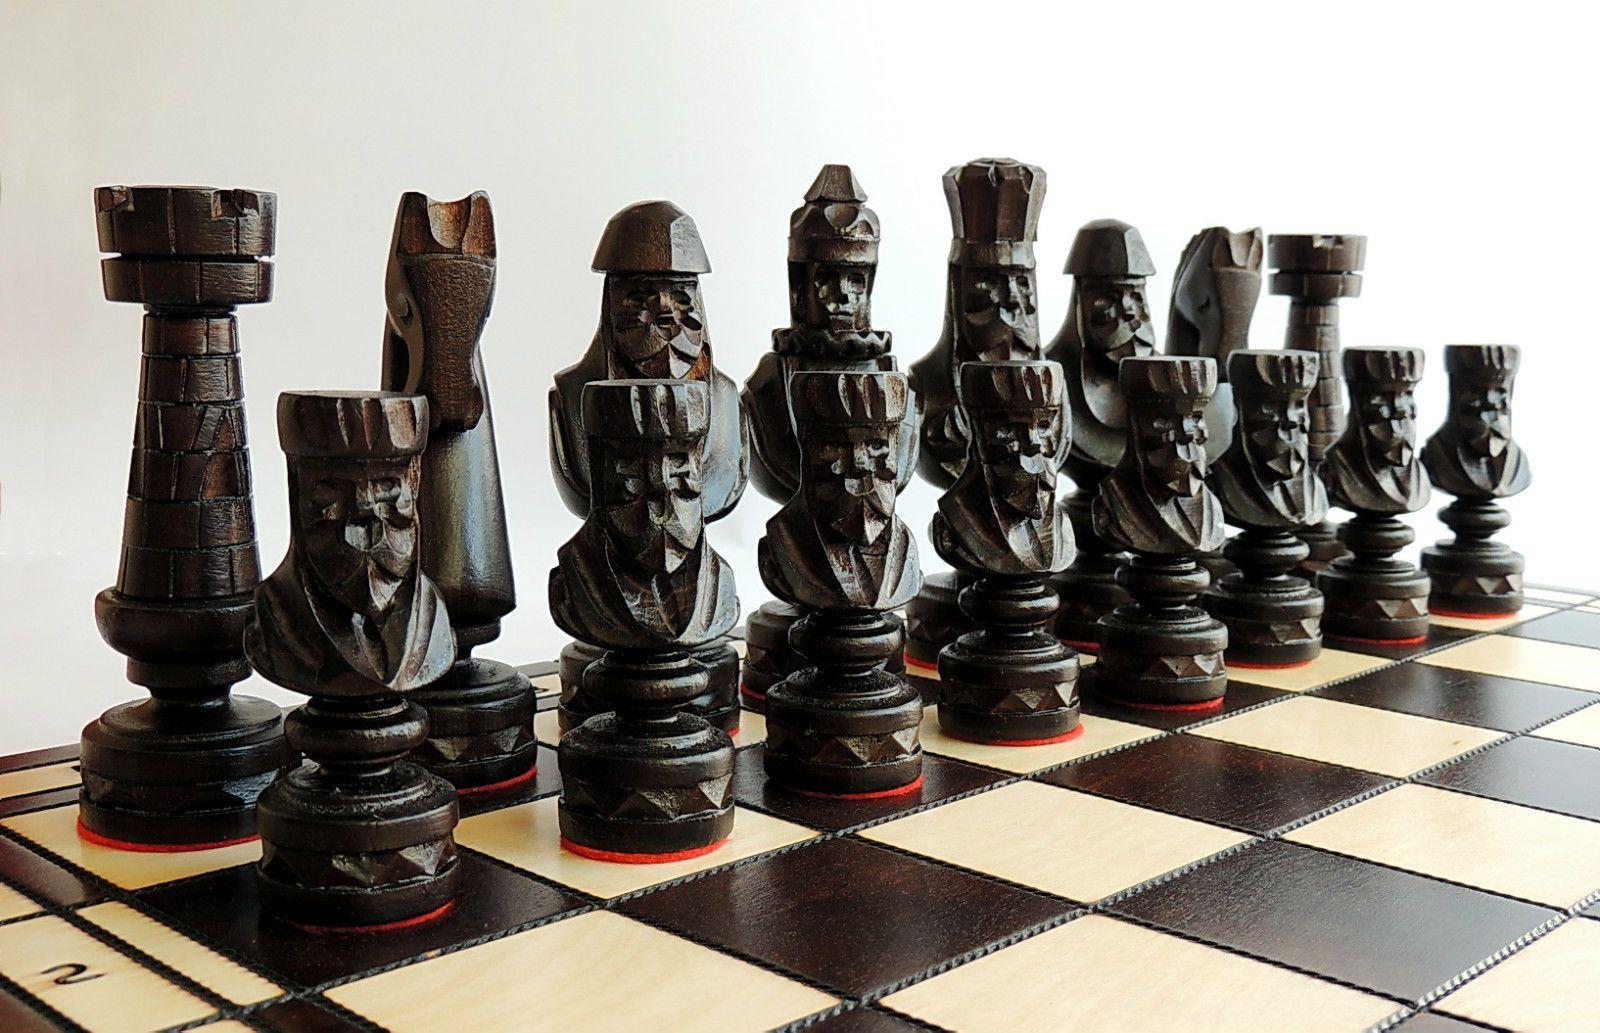 Luxury Cezar Quot Wooden Chess Set 60cm X 60cm Hand Carved